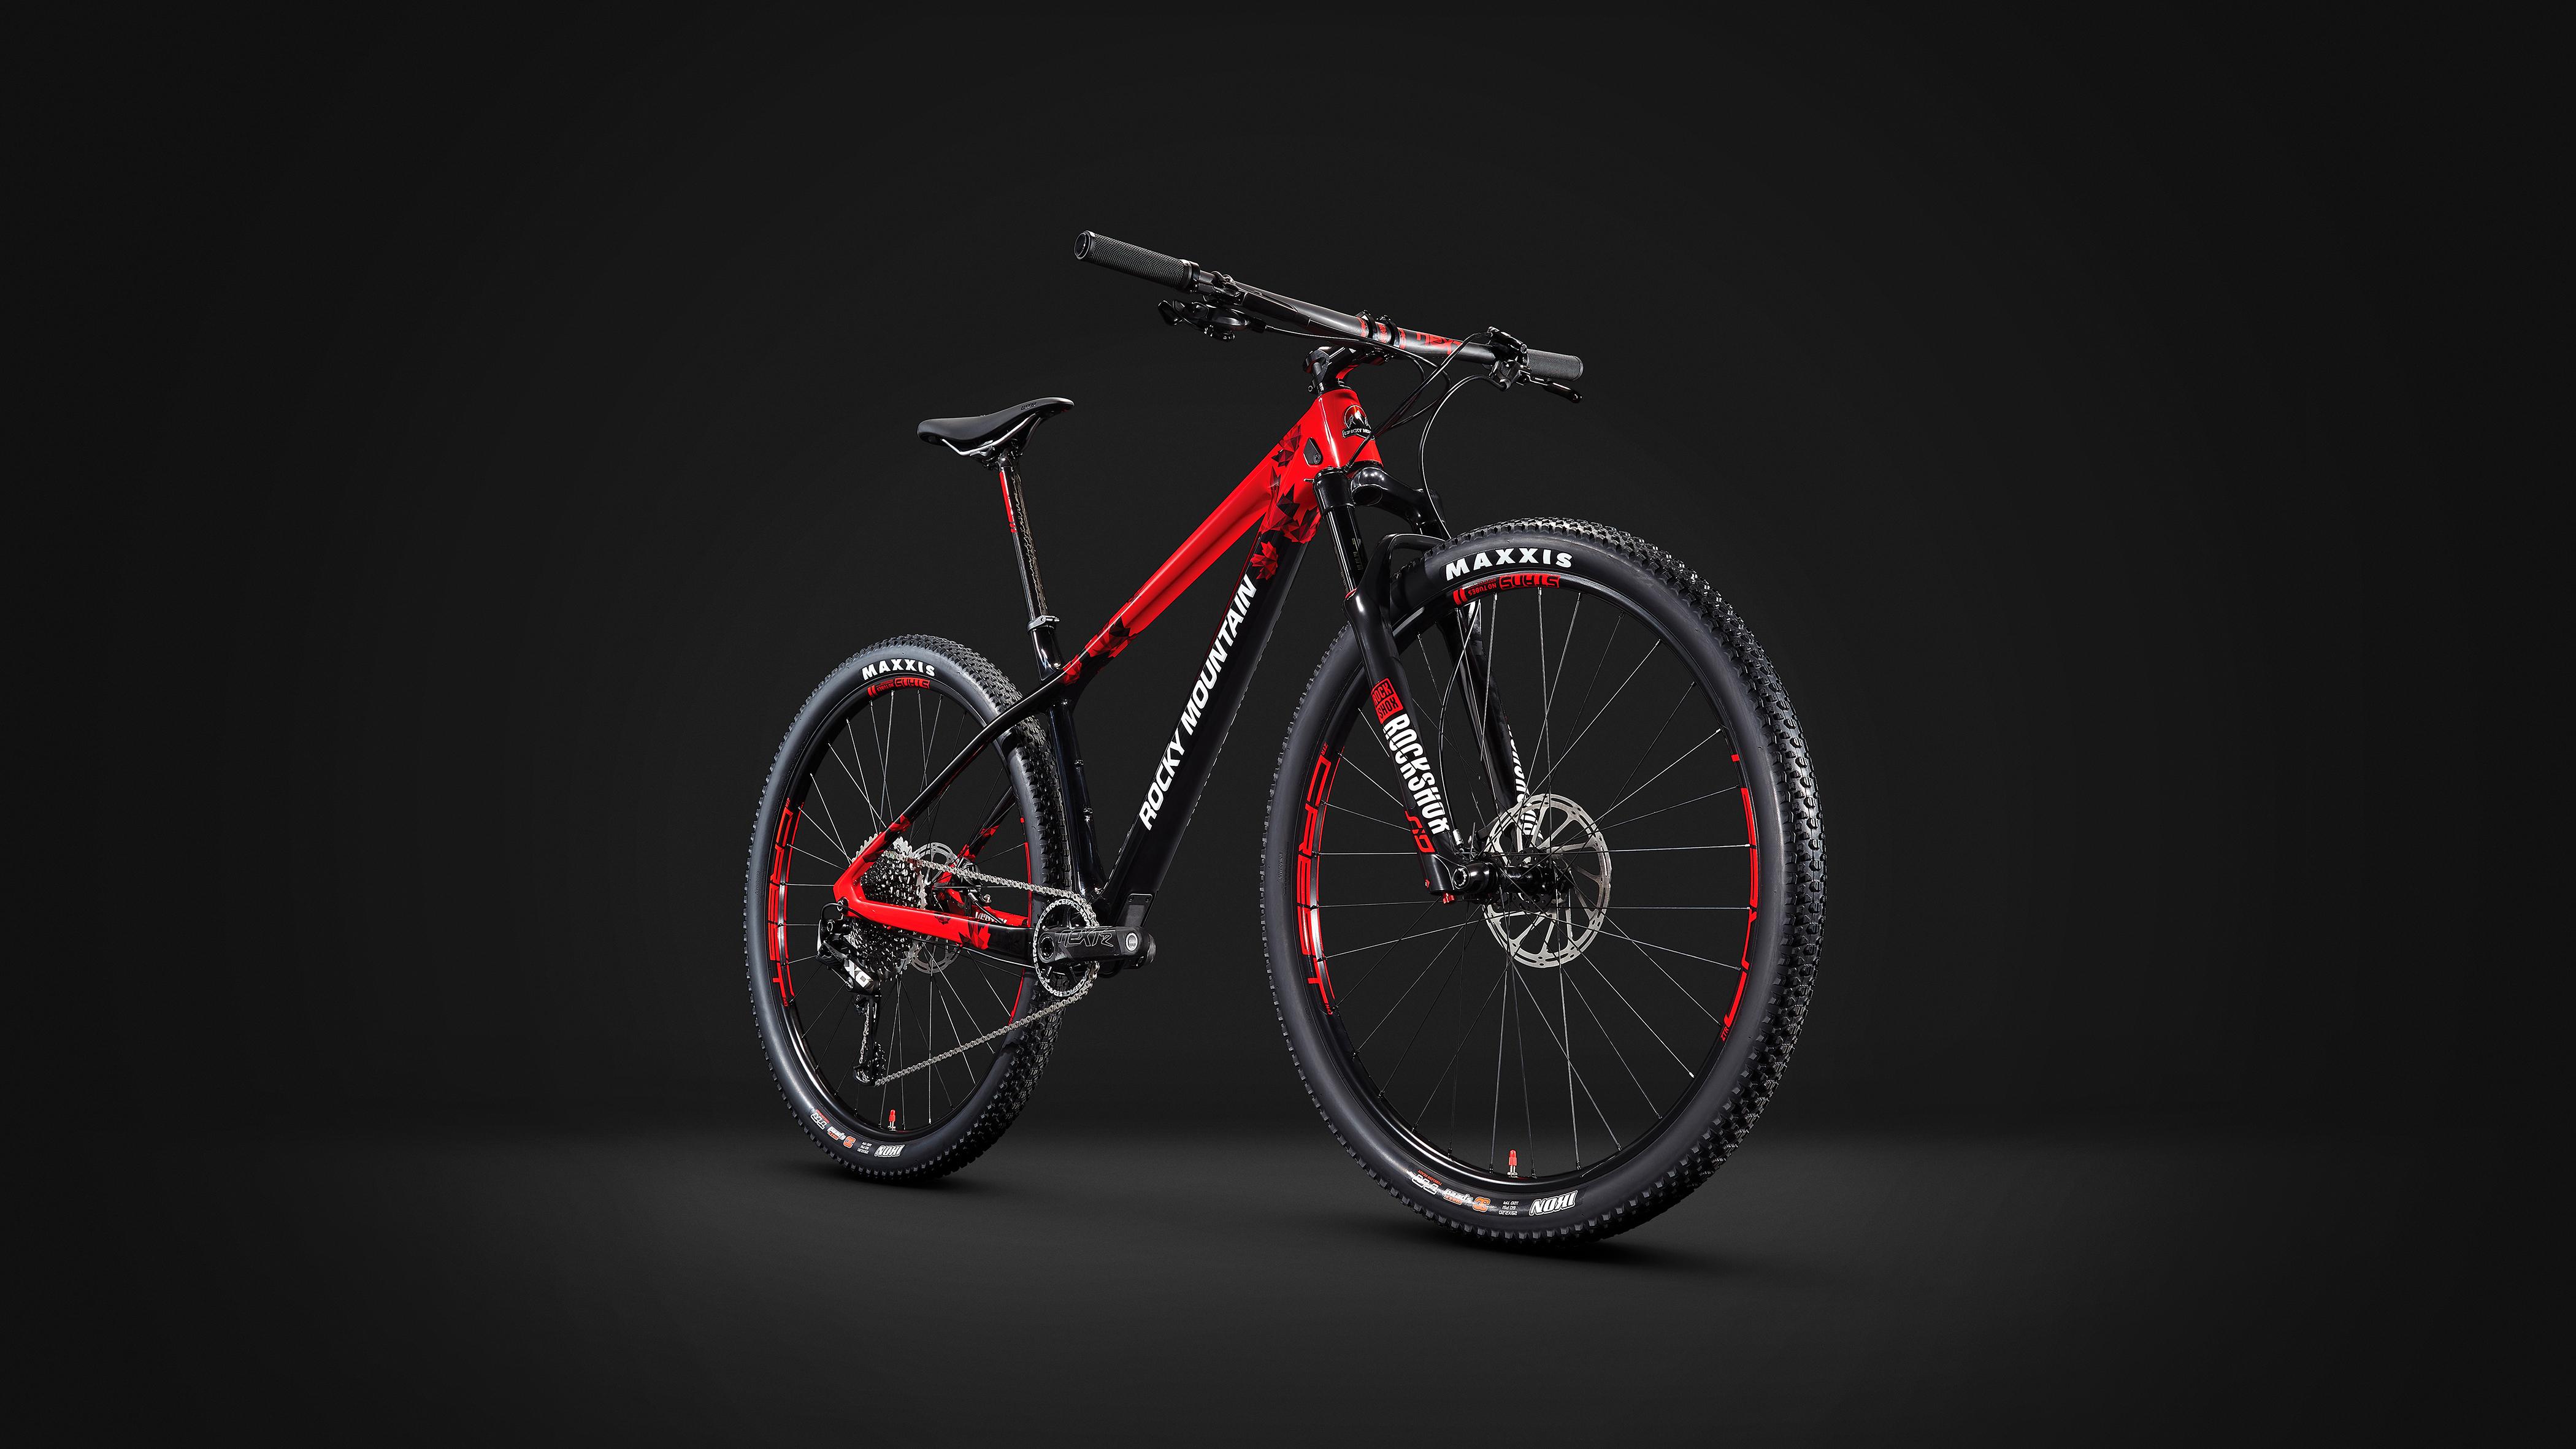 Brand-New Frame Geo and Build Spec for Rocky Mountain Vertex XC Race Hardtail Mountain Bike - Singletracks Mountain Bike News